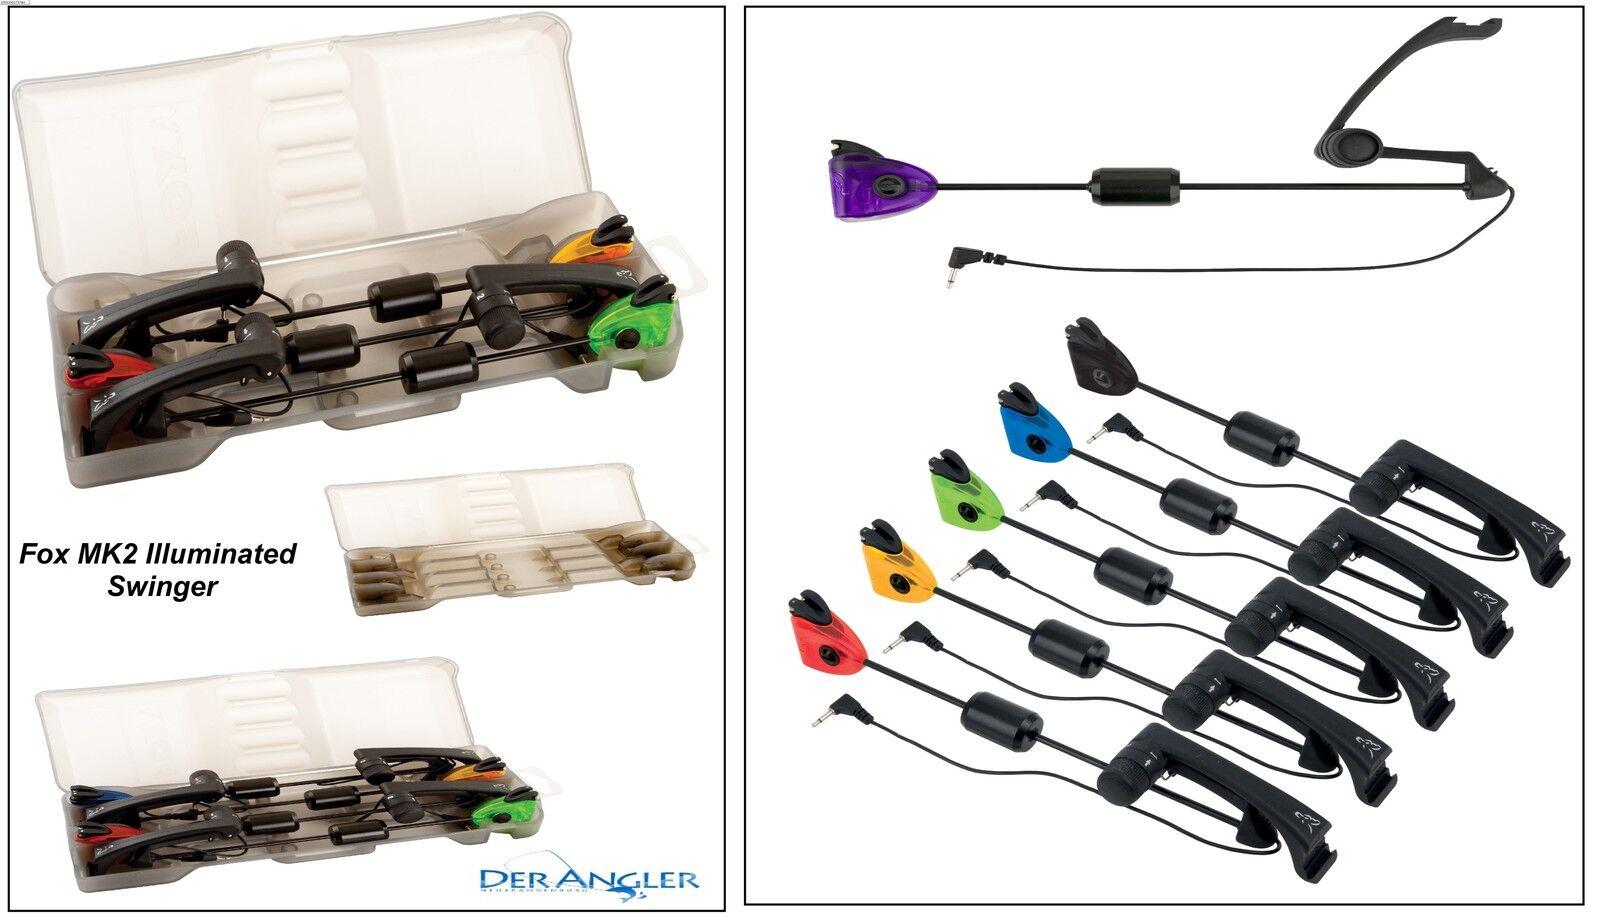 Fox mk2 illuminated swinger set 3 rod 4 rod  cañas box case vacío swinger 6 Colors  Disfruta de un 50% de descuento.